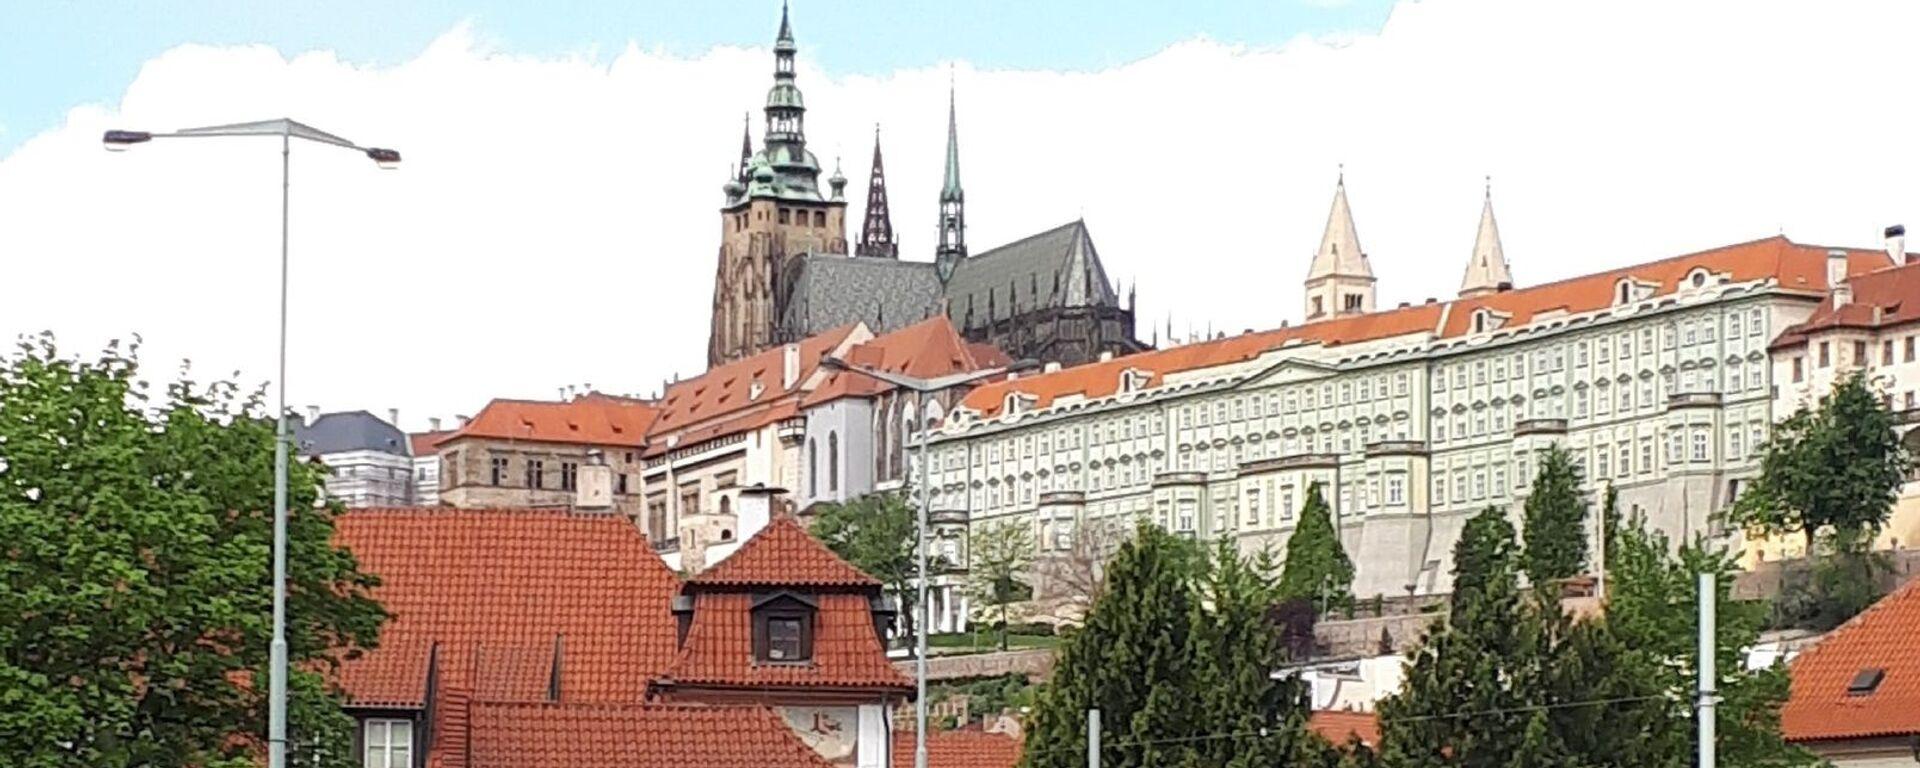 Praha v době koronaviru - Sputnik Česká republika, 1920, 27.05.2021